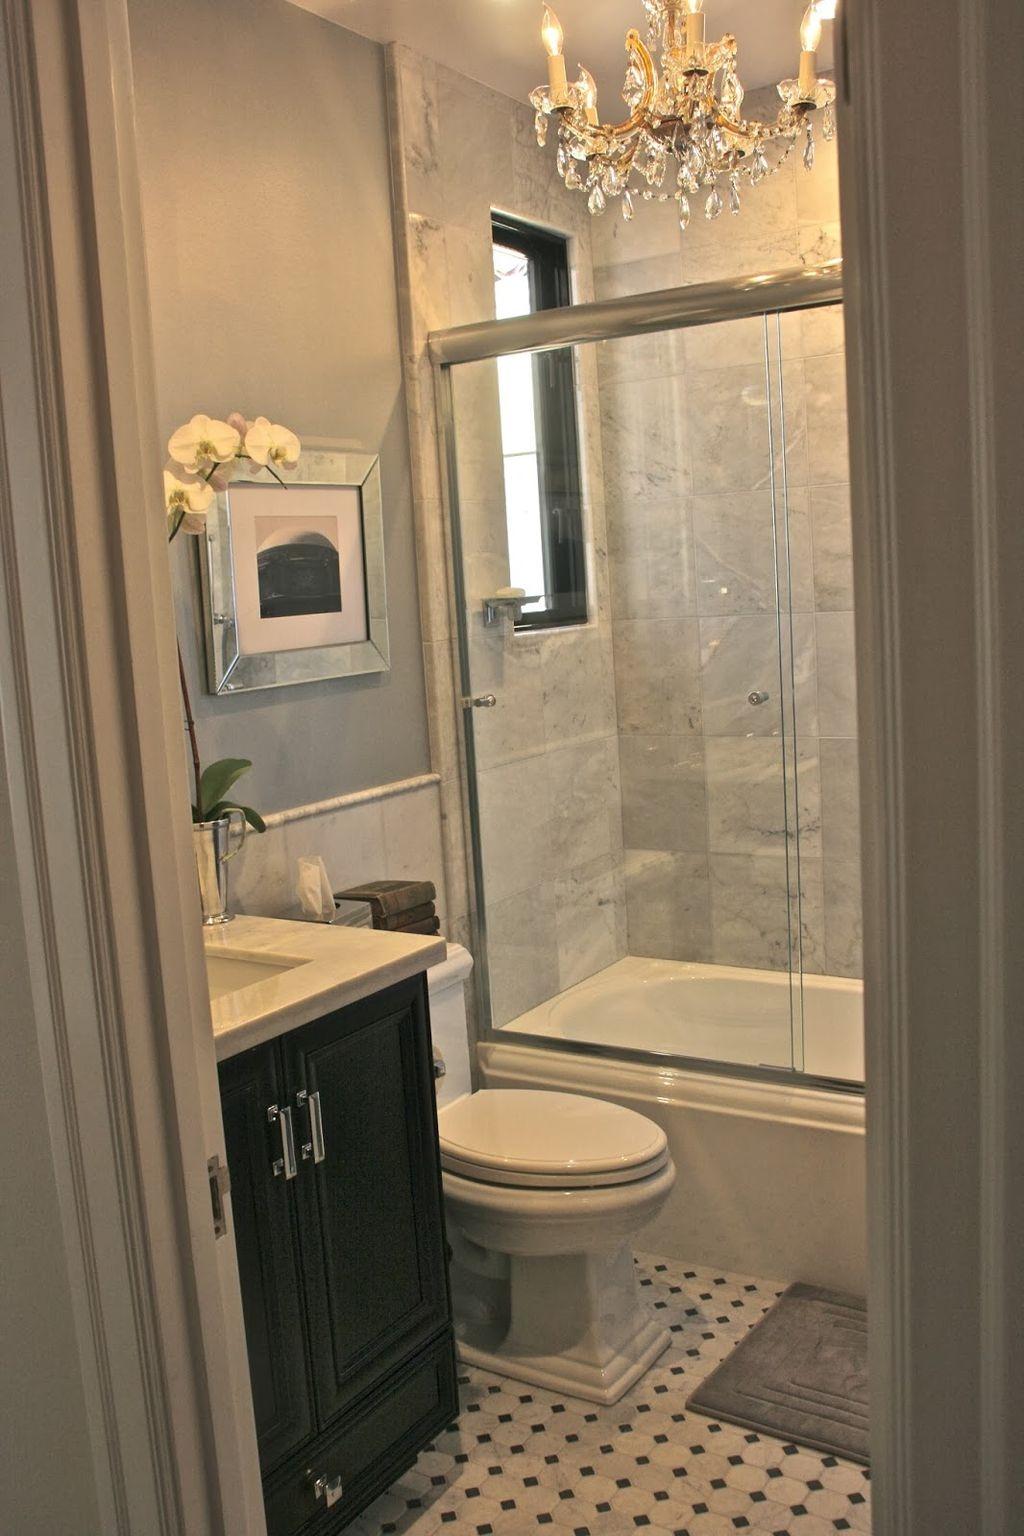 39 Cool And Stylish Small Bathroom Design Ideas31